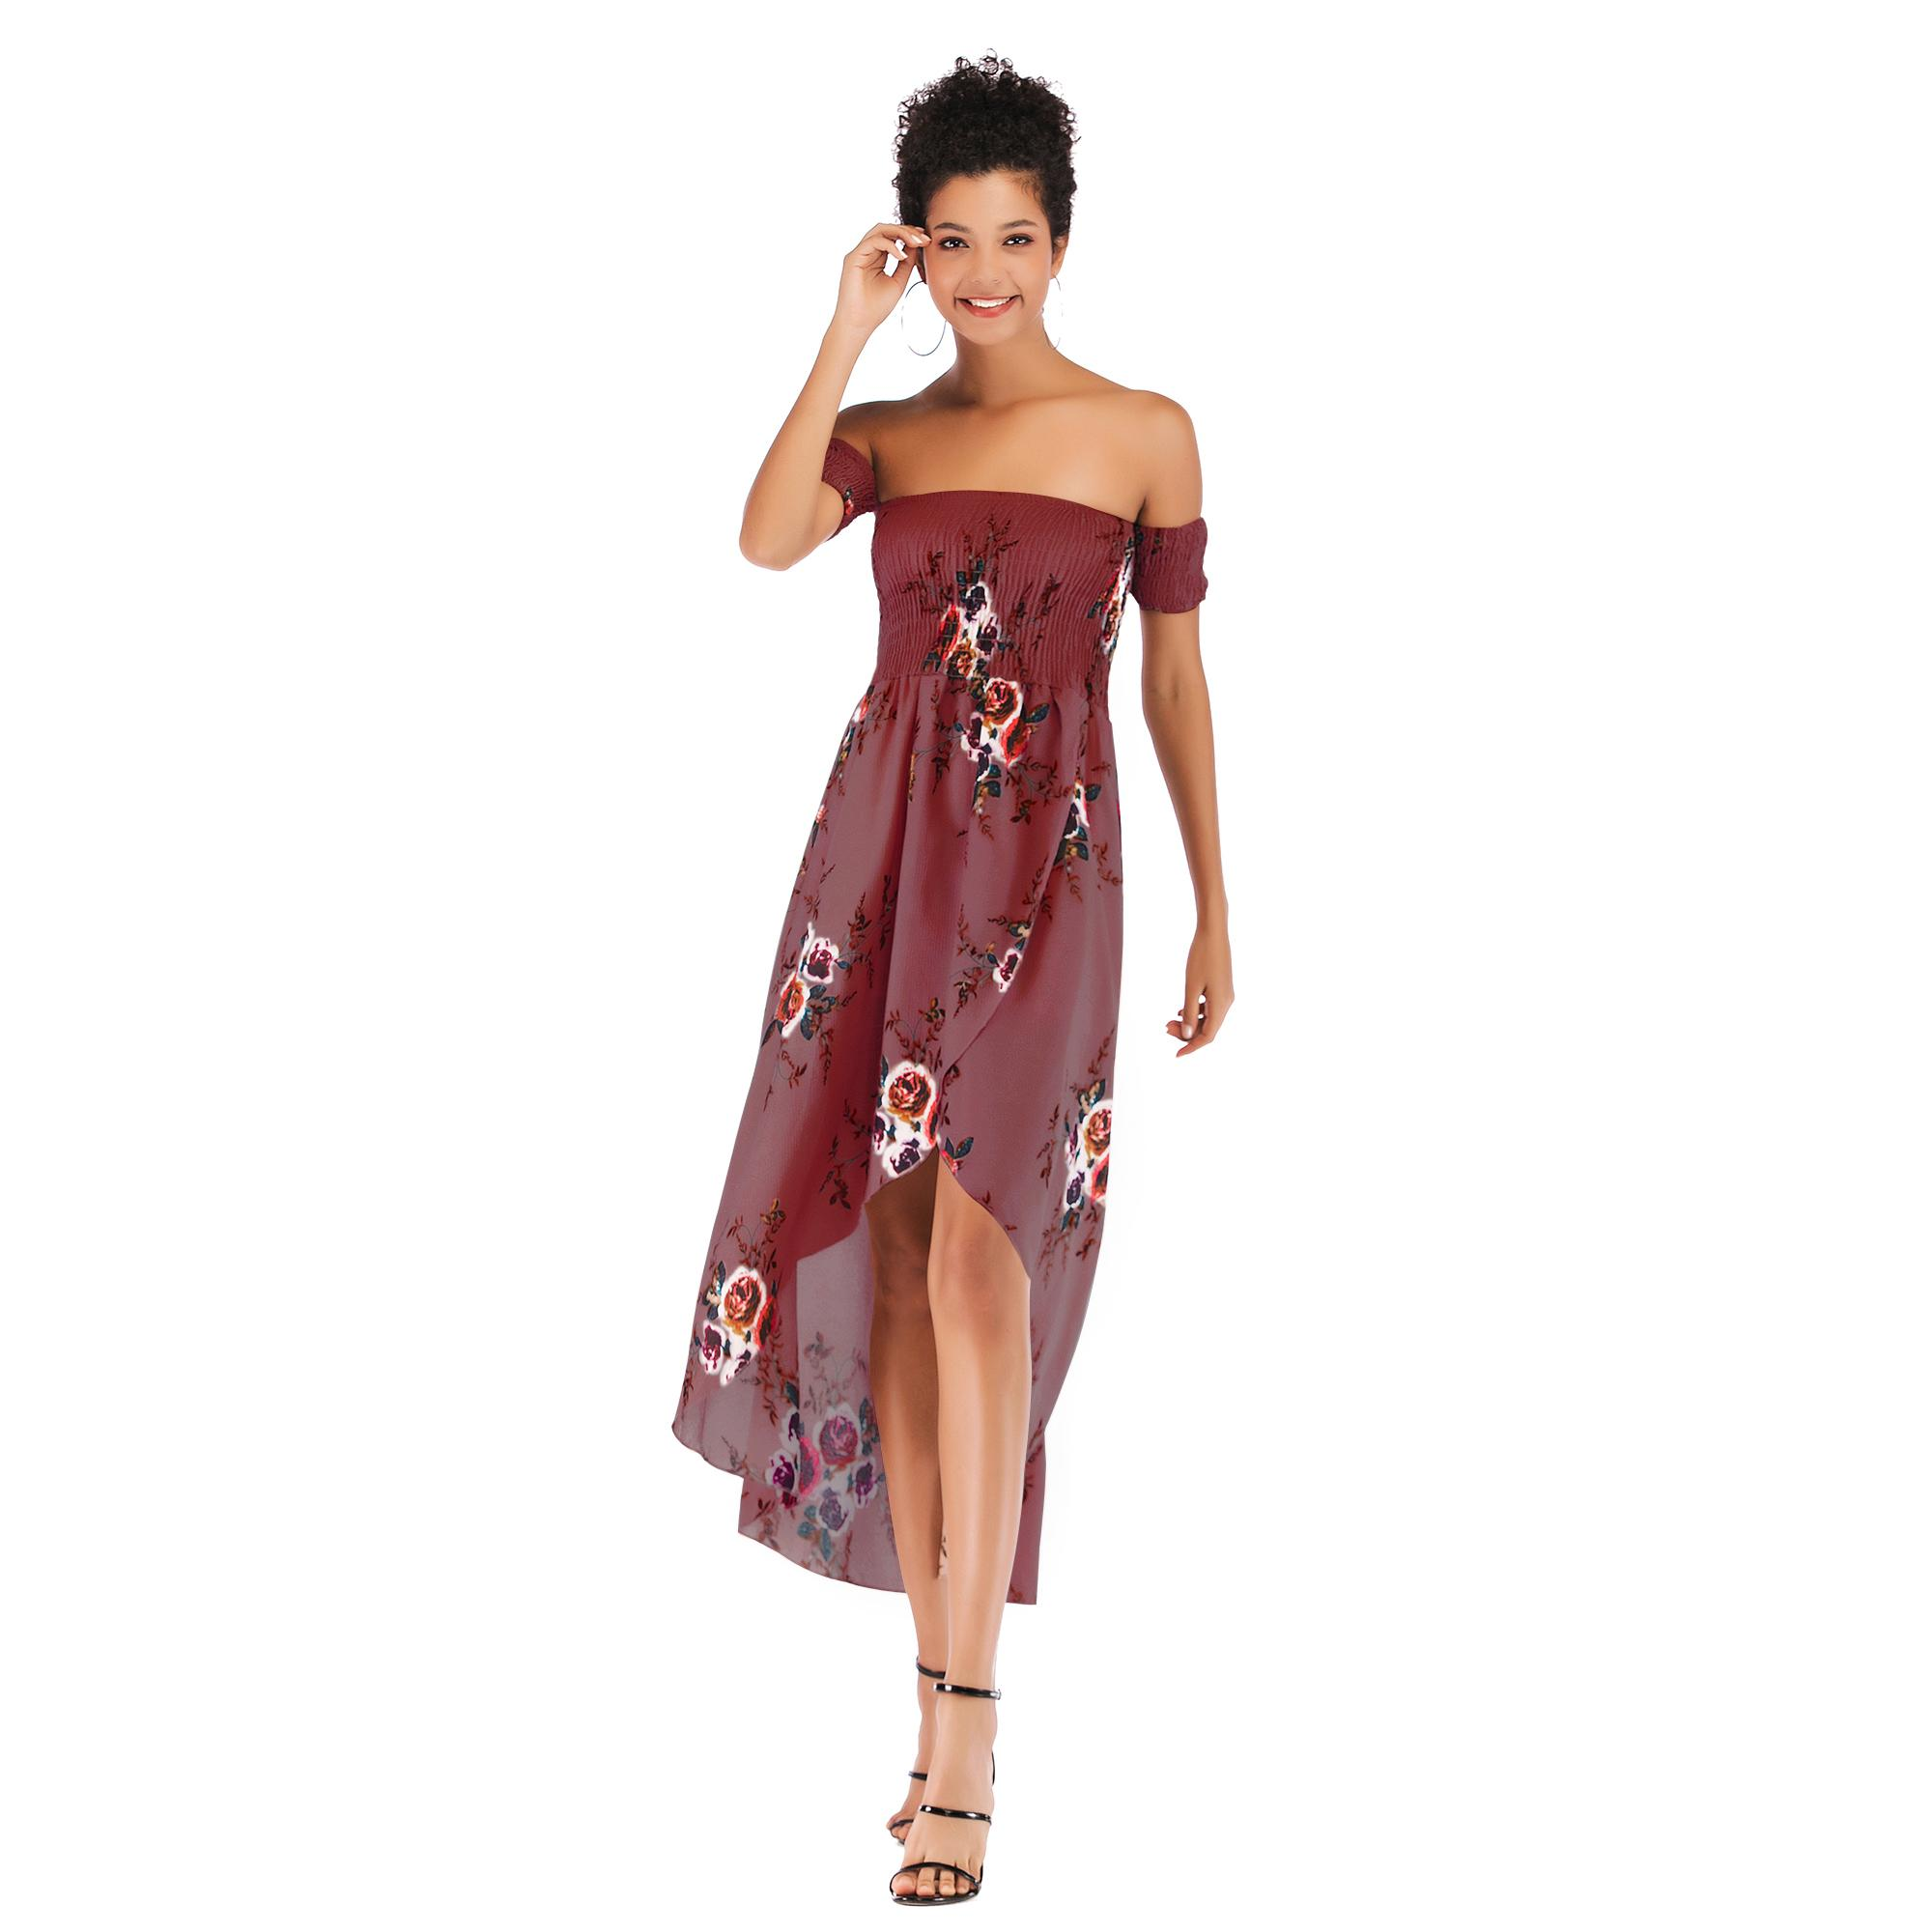 5c45ed83c563 Womens Summer Fashion Flora Printed Dresses Women Holiday Style Chiffon  Sexy Slash Neck Asymmetrical Mid Calf Skirt Ladie Casual Clothes Summer  Flower ...